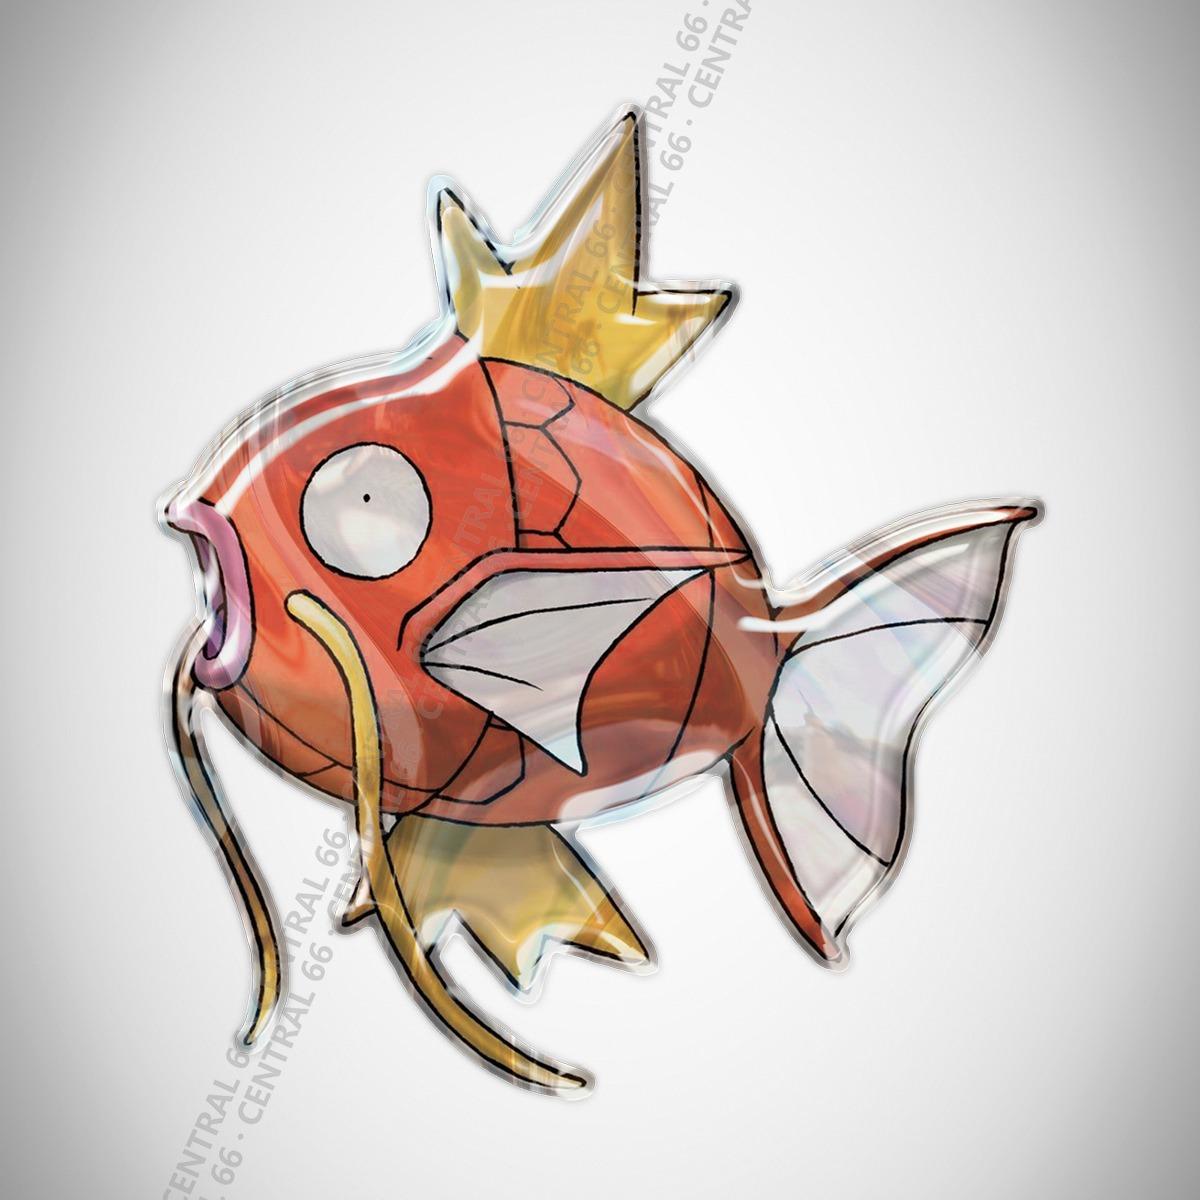 Adesivo Desenho Pokemon Magikarp Resinado R 29 90 Em Mercado Livre